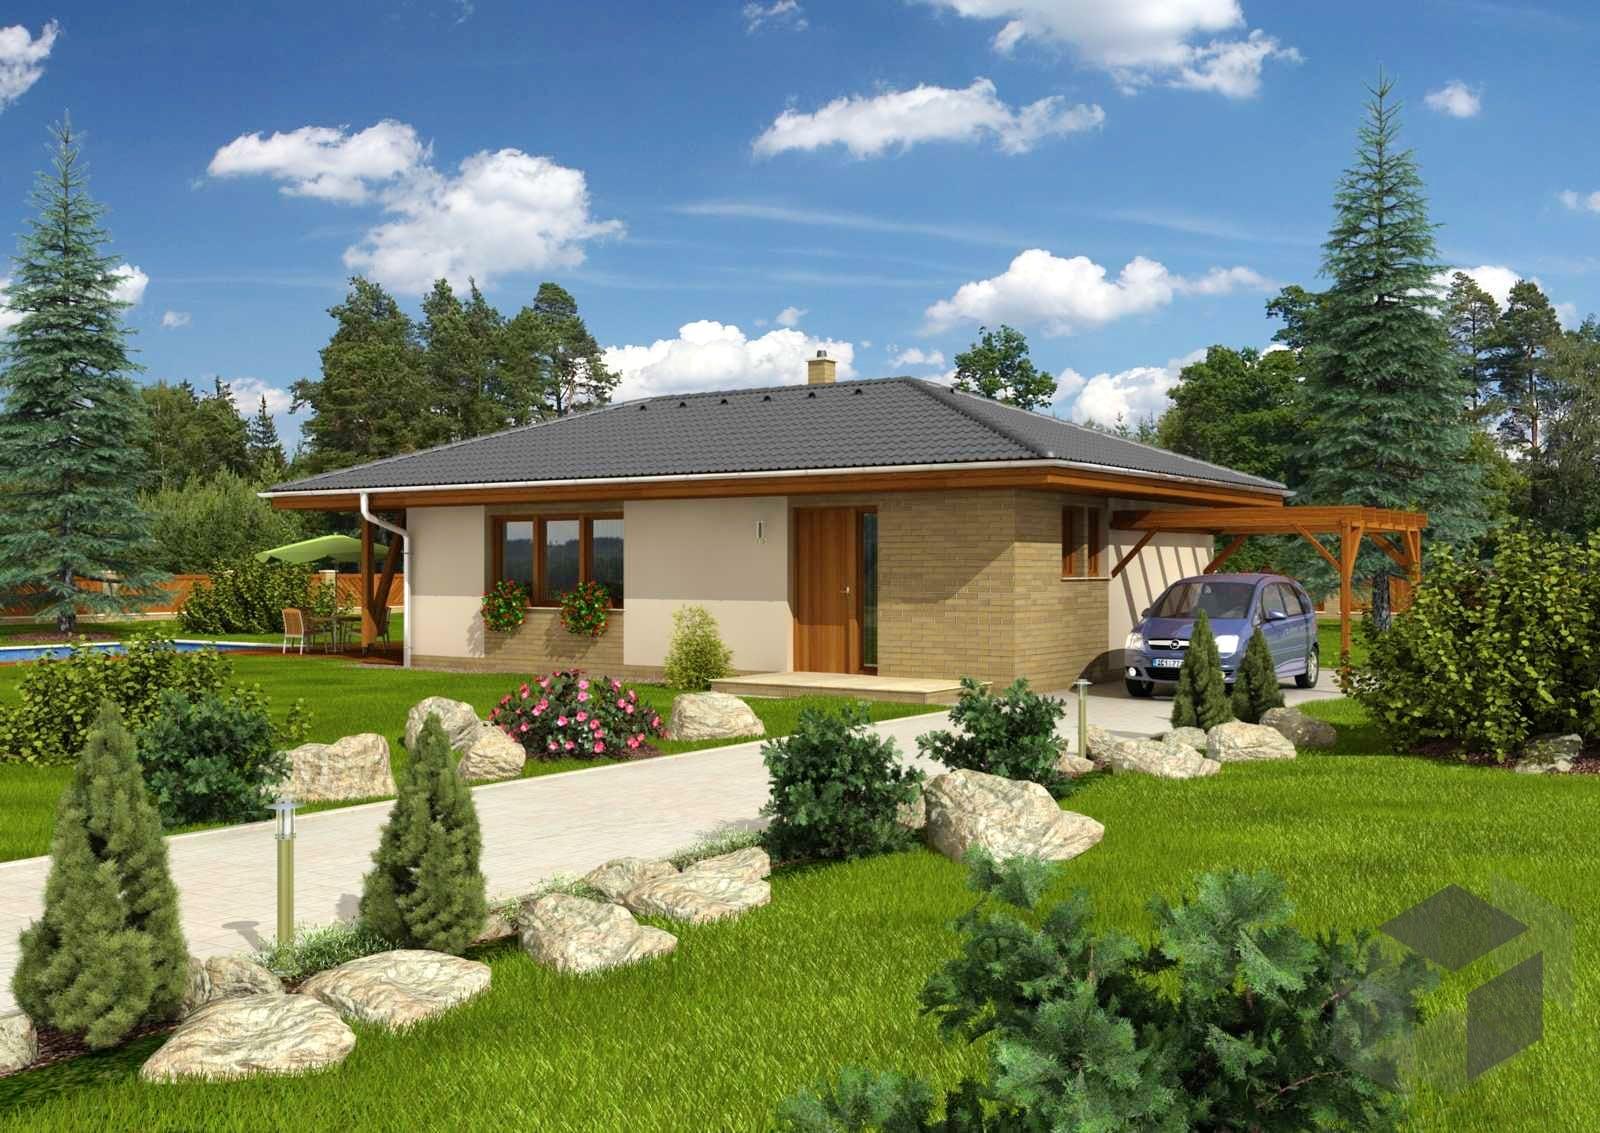 Bungalow mallorca inactive von cmf creativ massiv for Massiv fertighaus bungalow